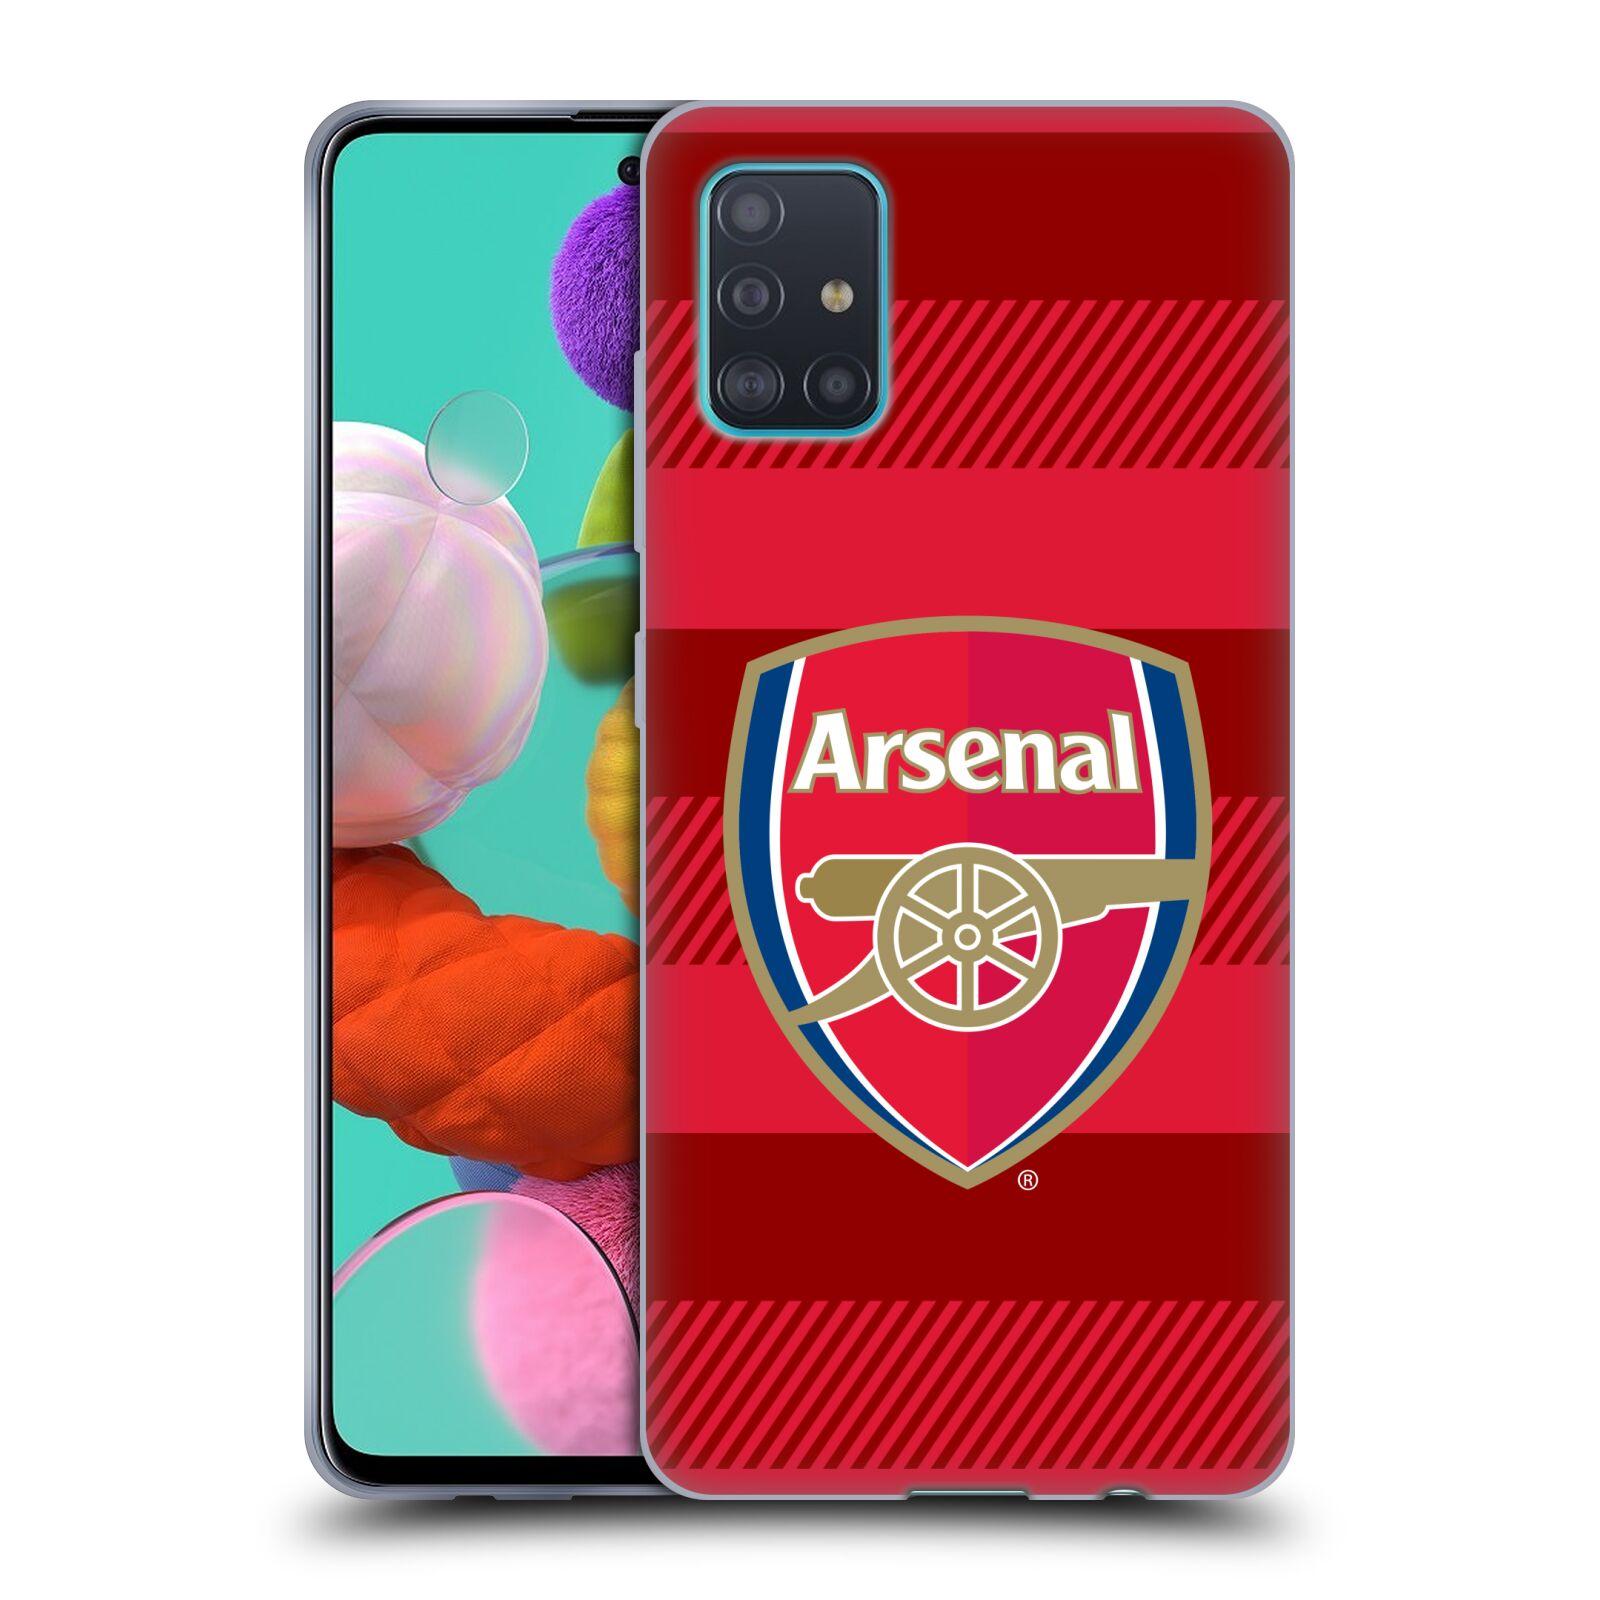 Silikonové pouzdro na mobil Samsung Galaxy A51 - Head Case - Arsenal FC - Logo s pruhy